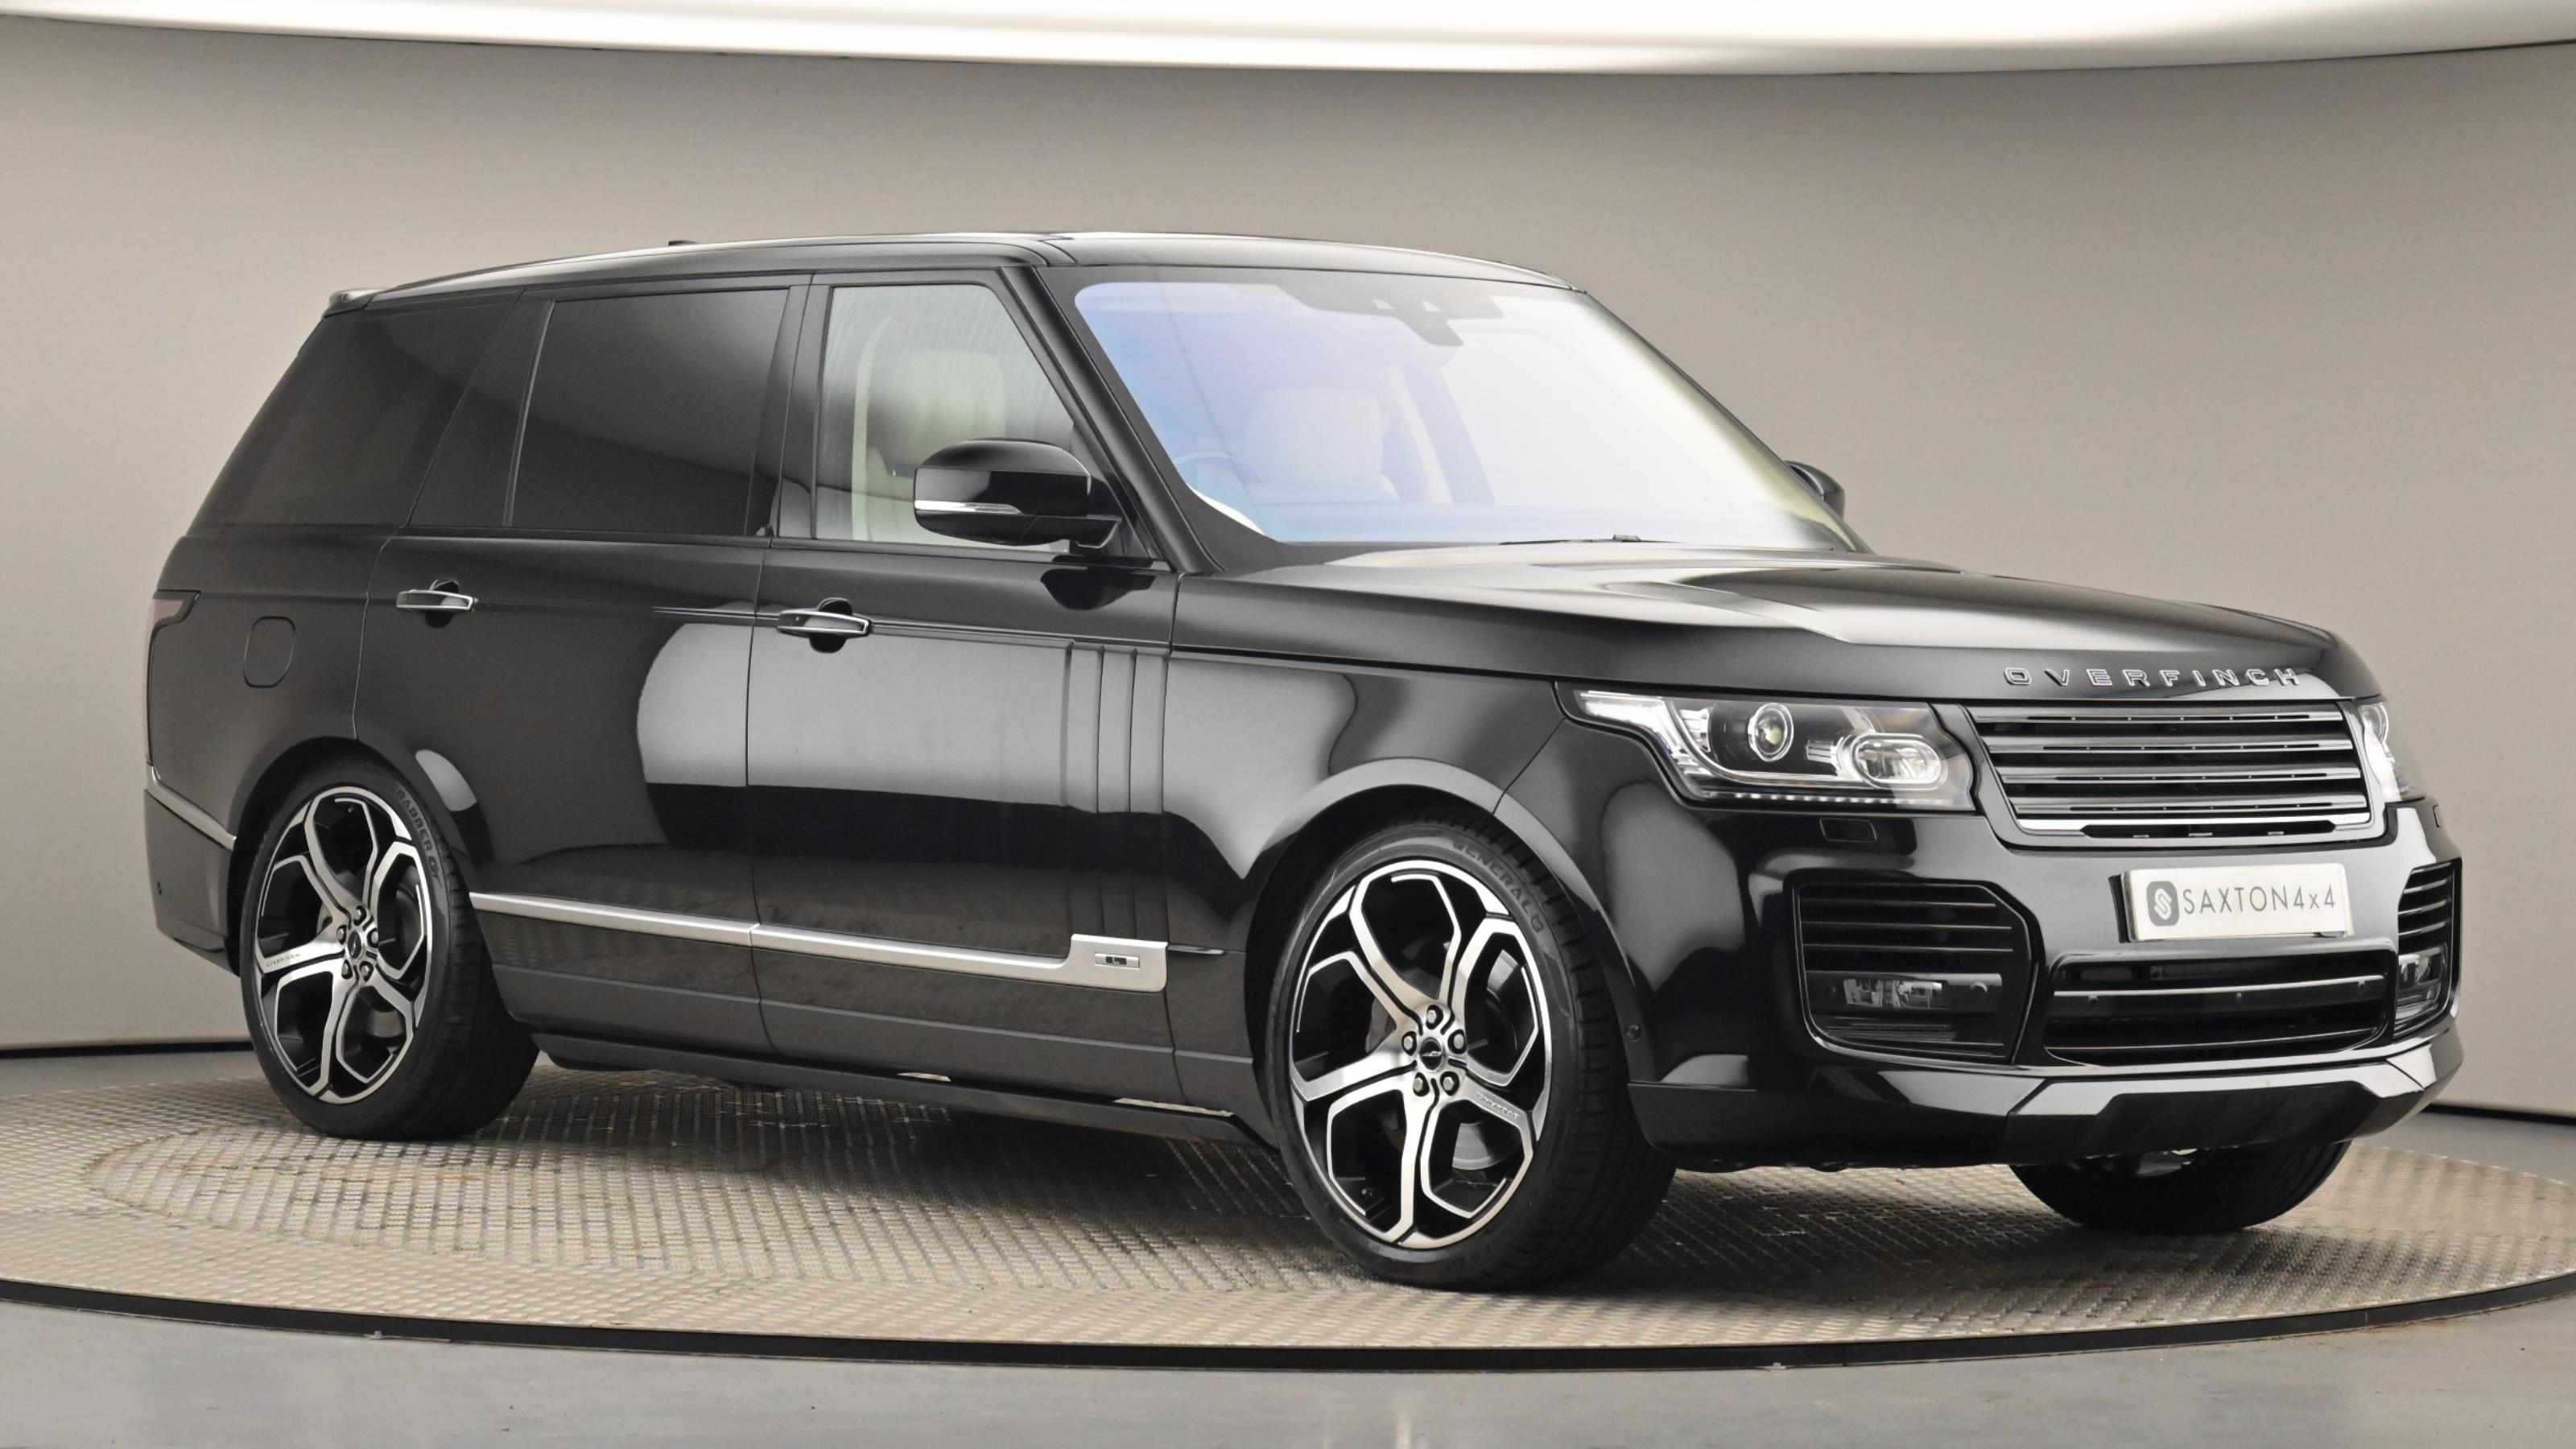 Used 2017 Land Rover RANGE ROVER 4.4 SDV8 Autobiography LWB 4dr Auto BLACK at Saxton4x4